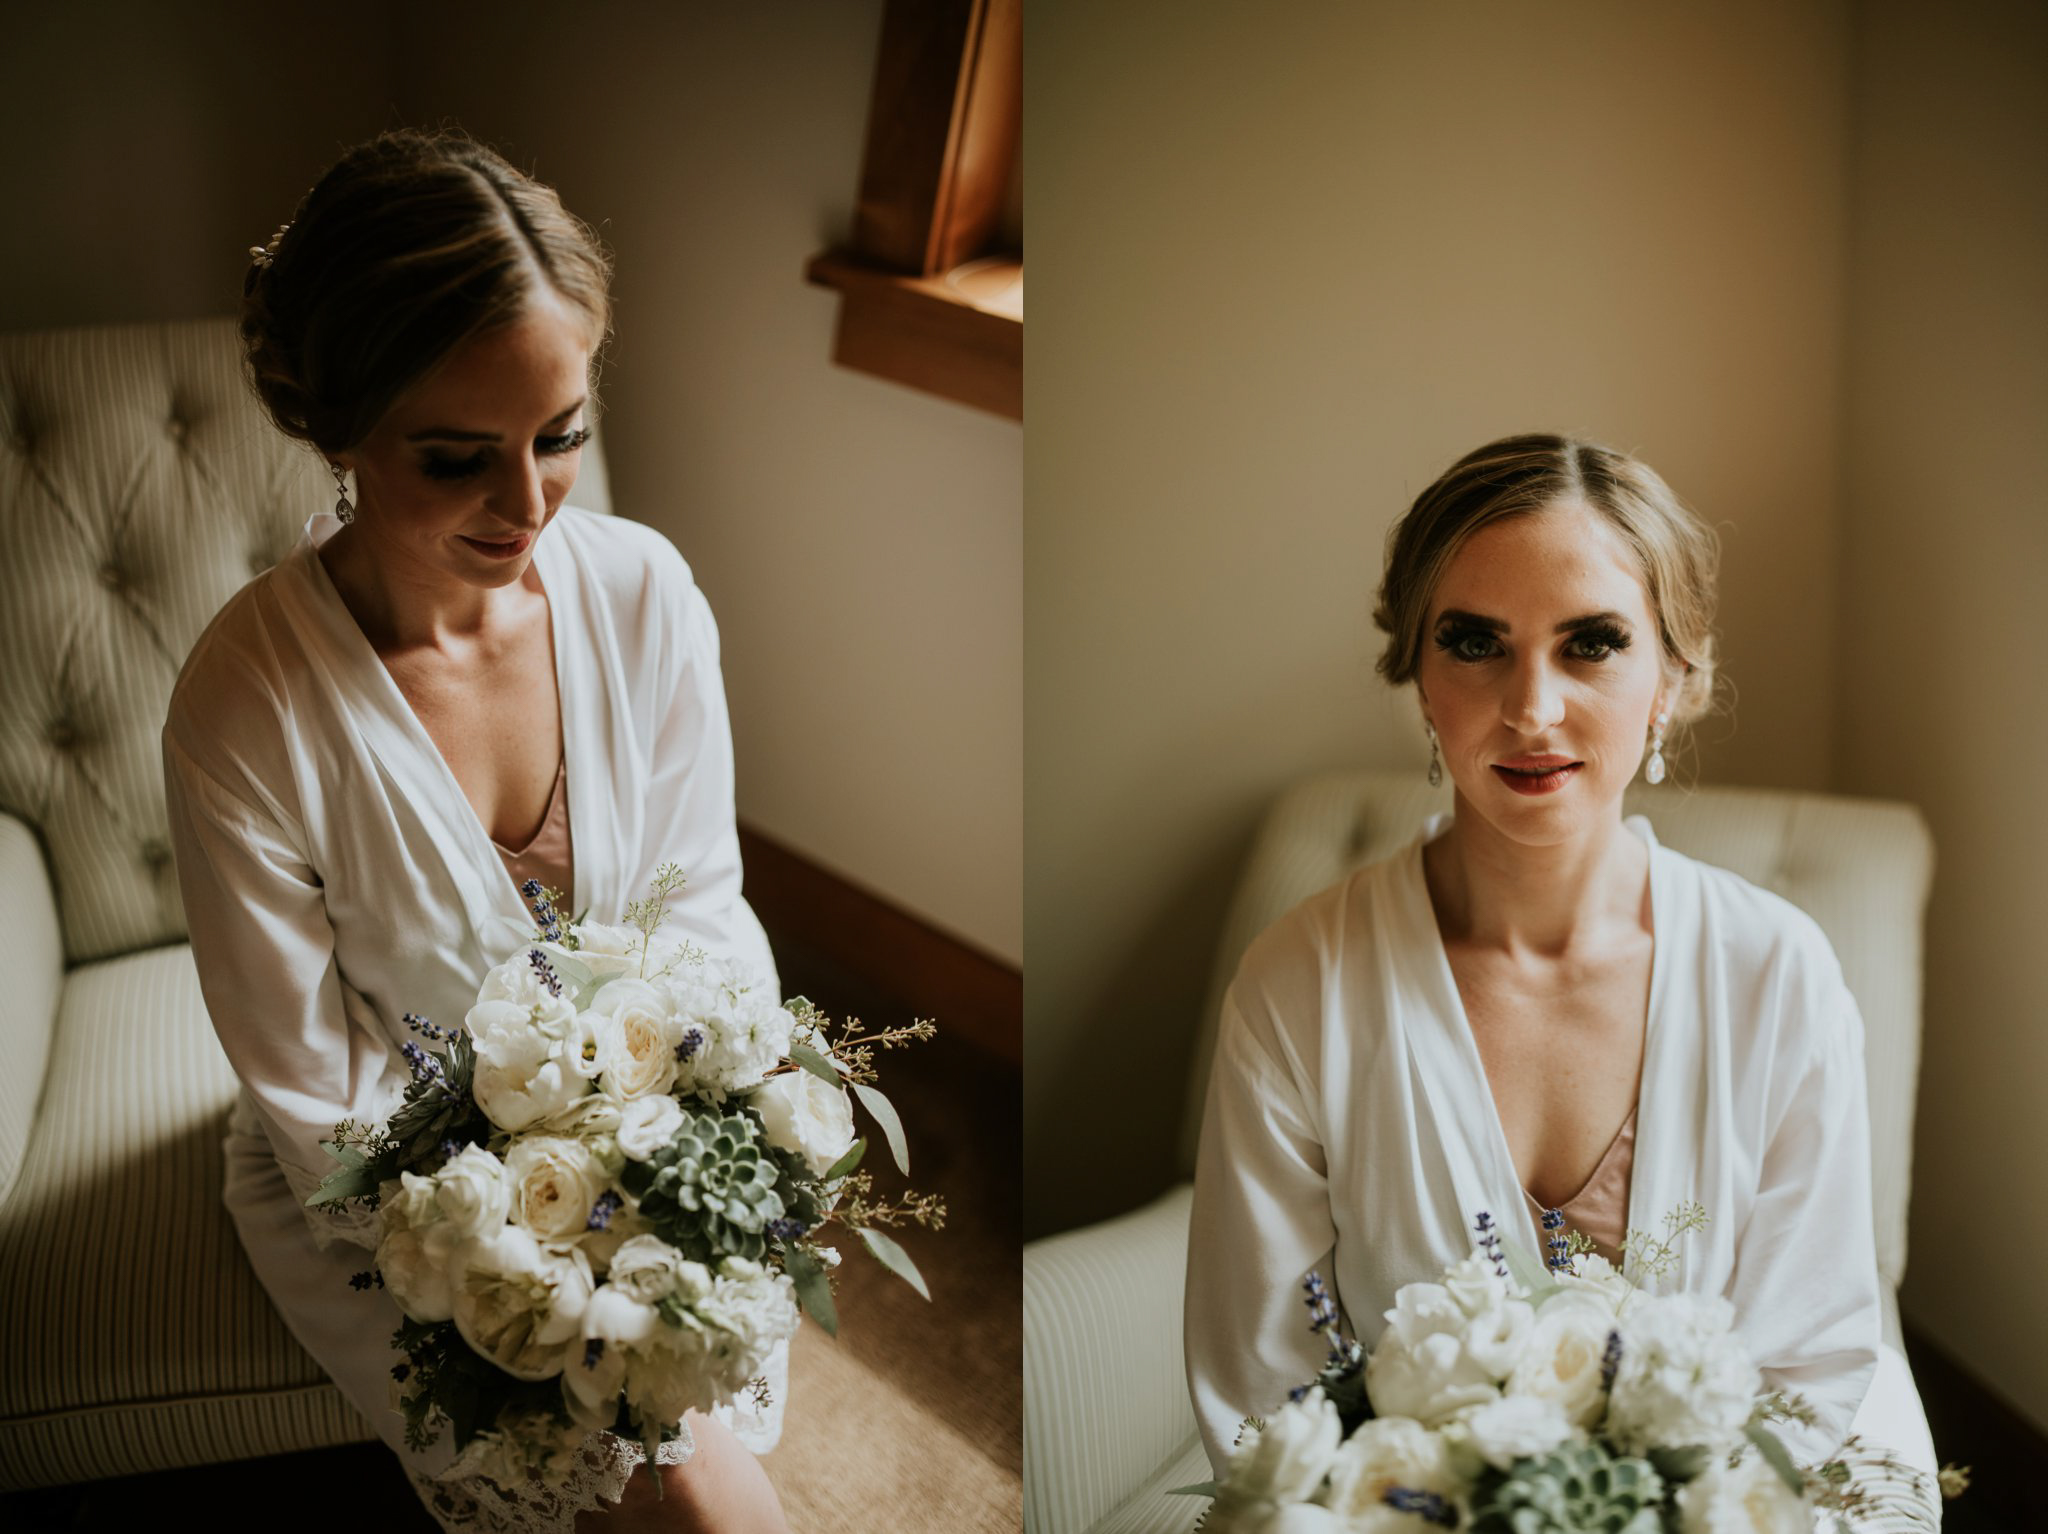 hollywood-school-house-wedding-seattle-photographer-caitlyn-nikula-16.jpg